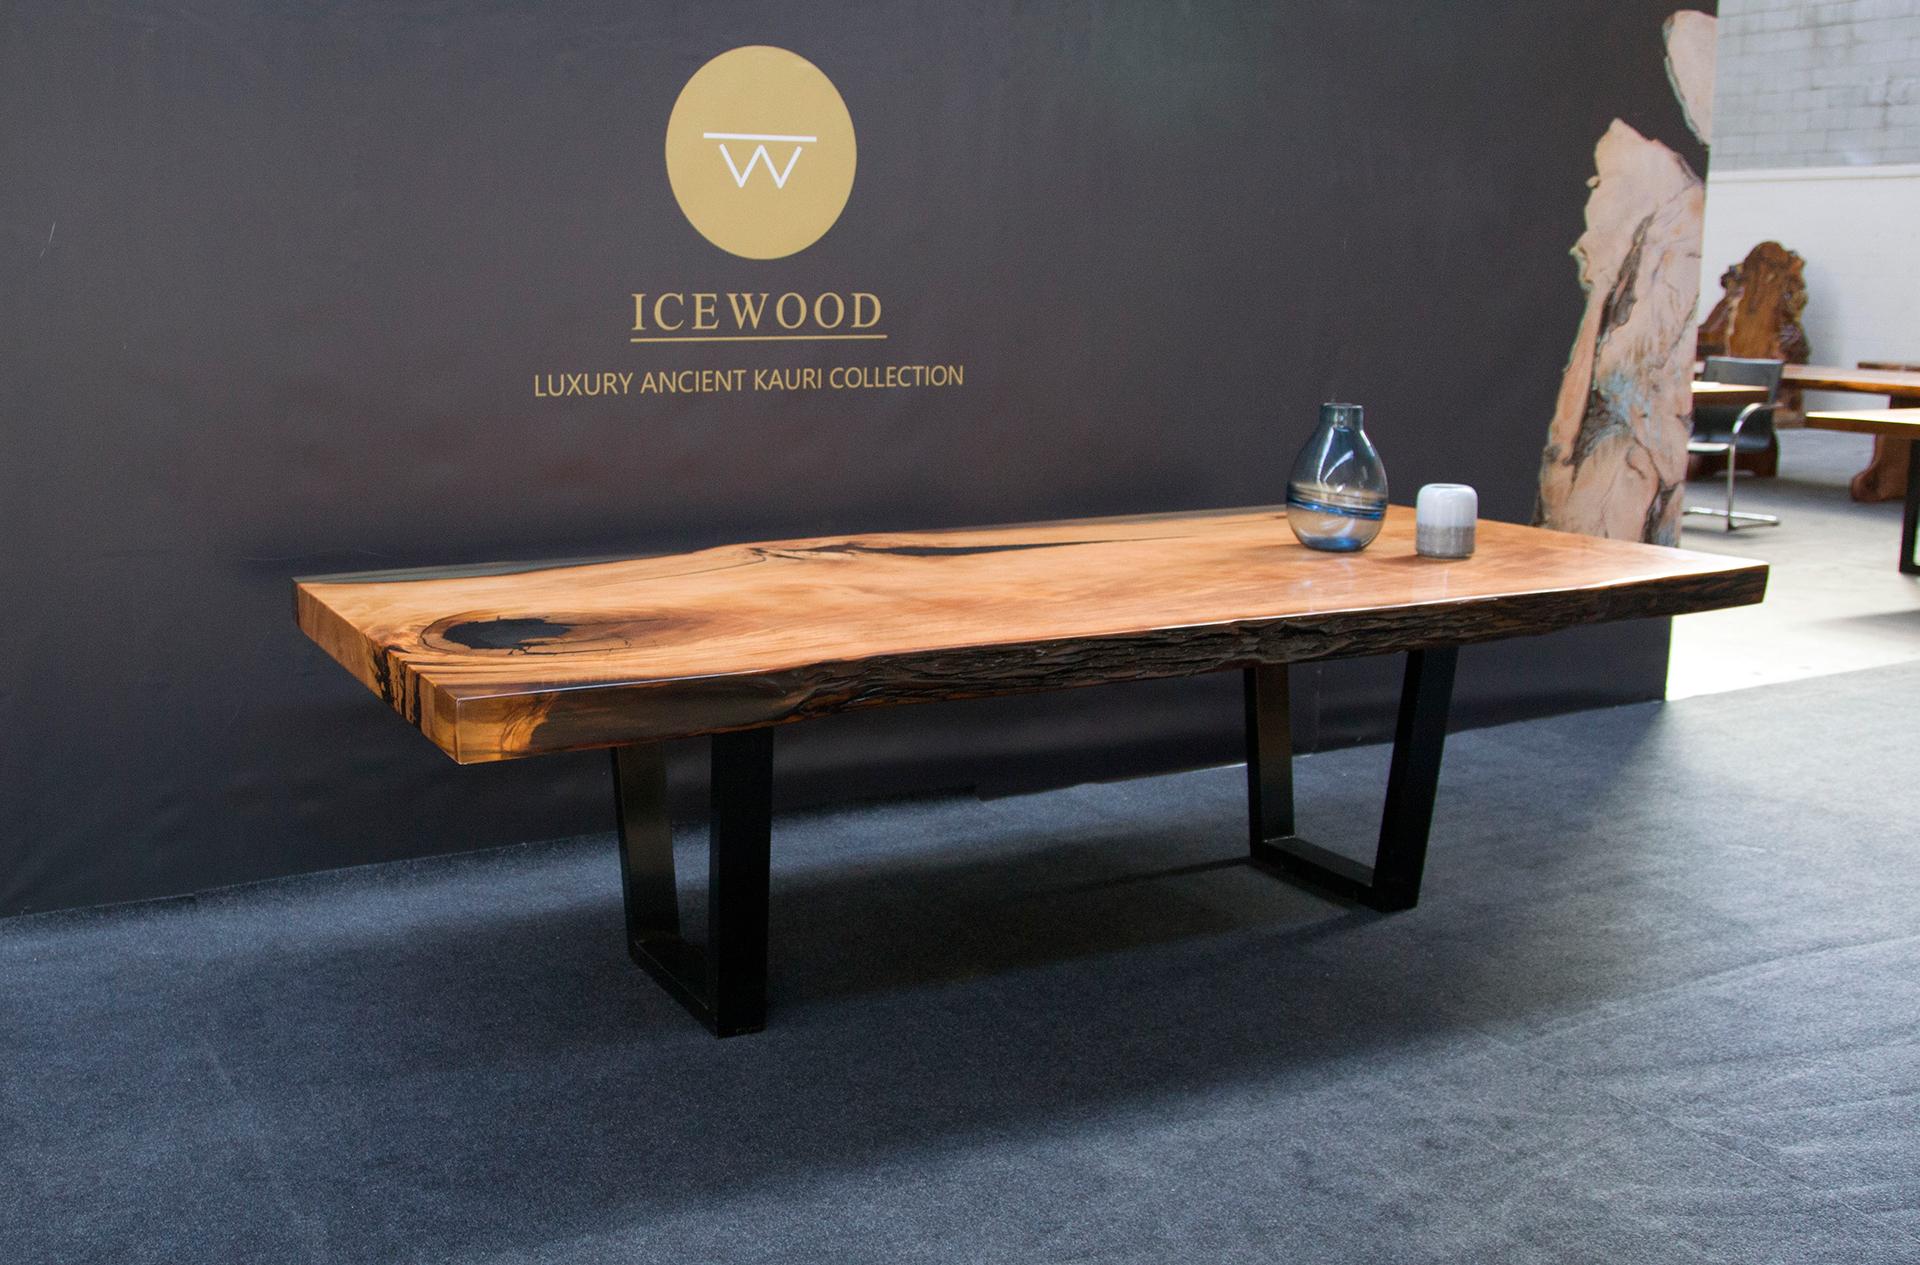 Golden Illusion Ancient Kauri table